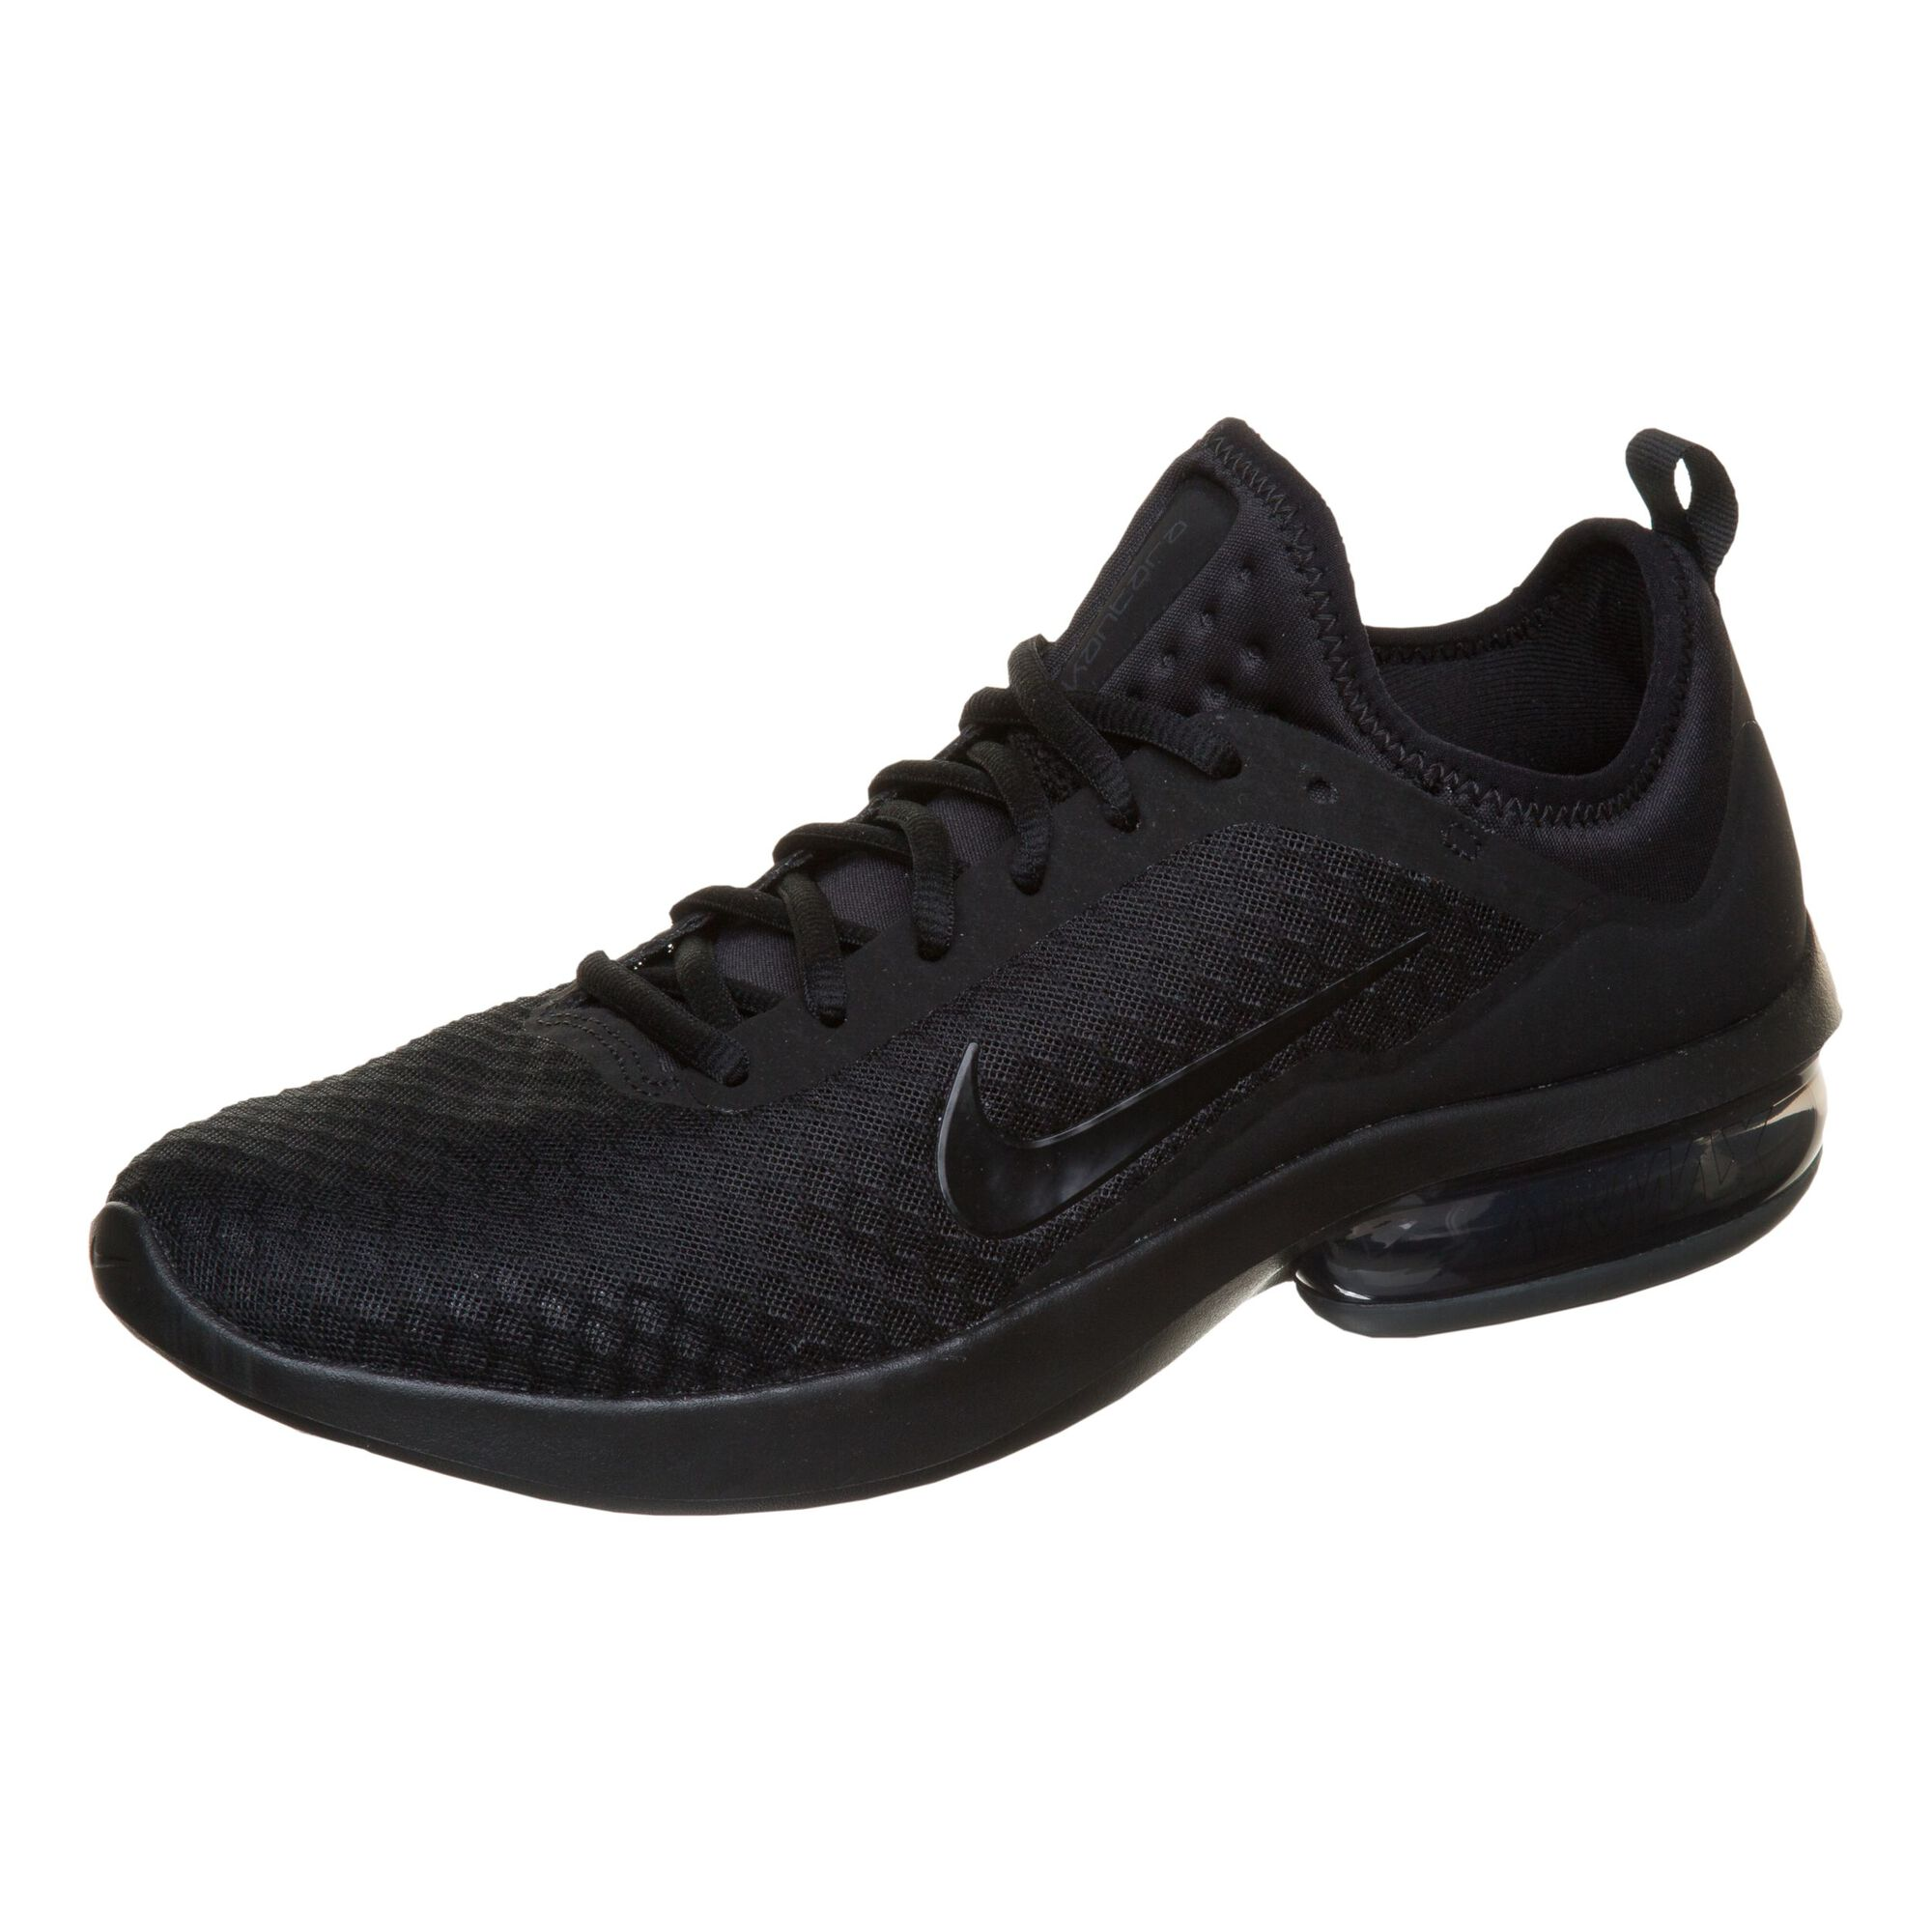 7f238ace39c6b buy Nike Air Max Kantara Neutral Running Shoe Men - Black